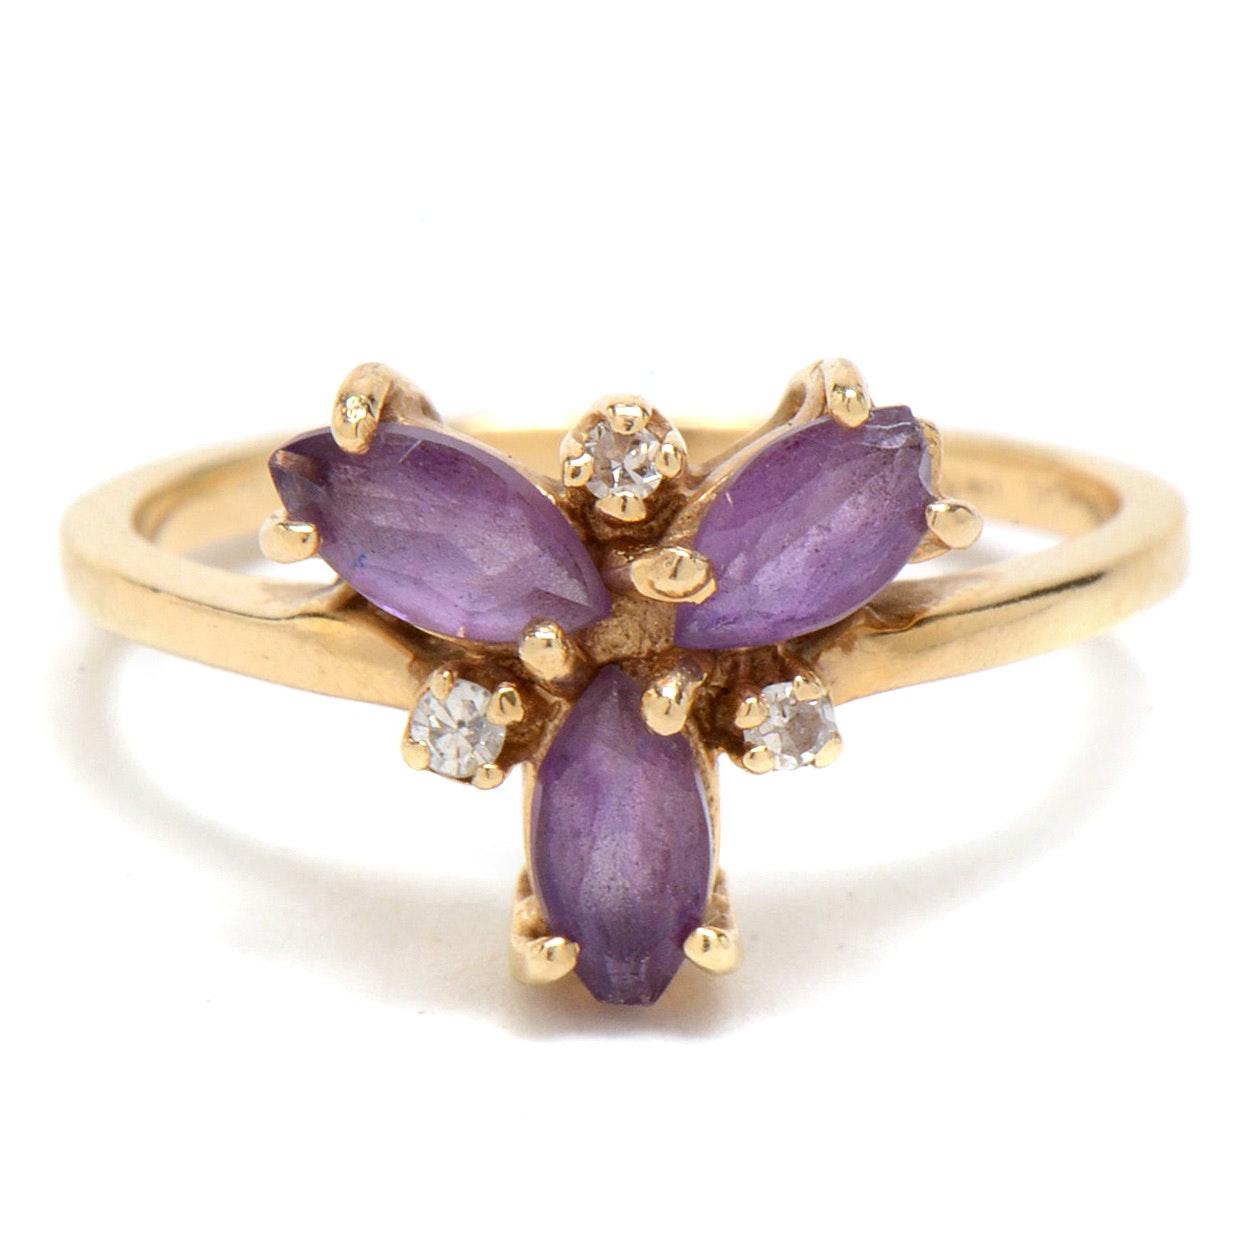 14K Plumb Yellow Gold, Amethyst and Diamond Ring